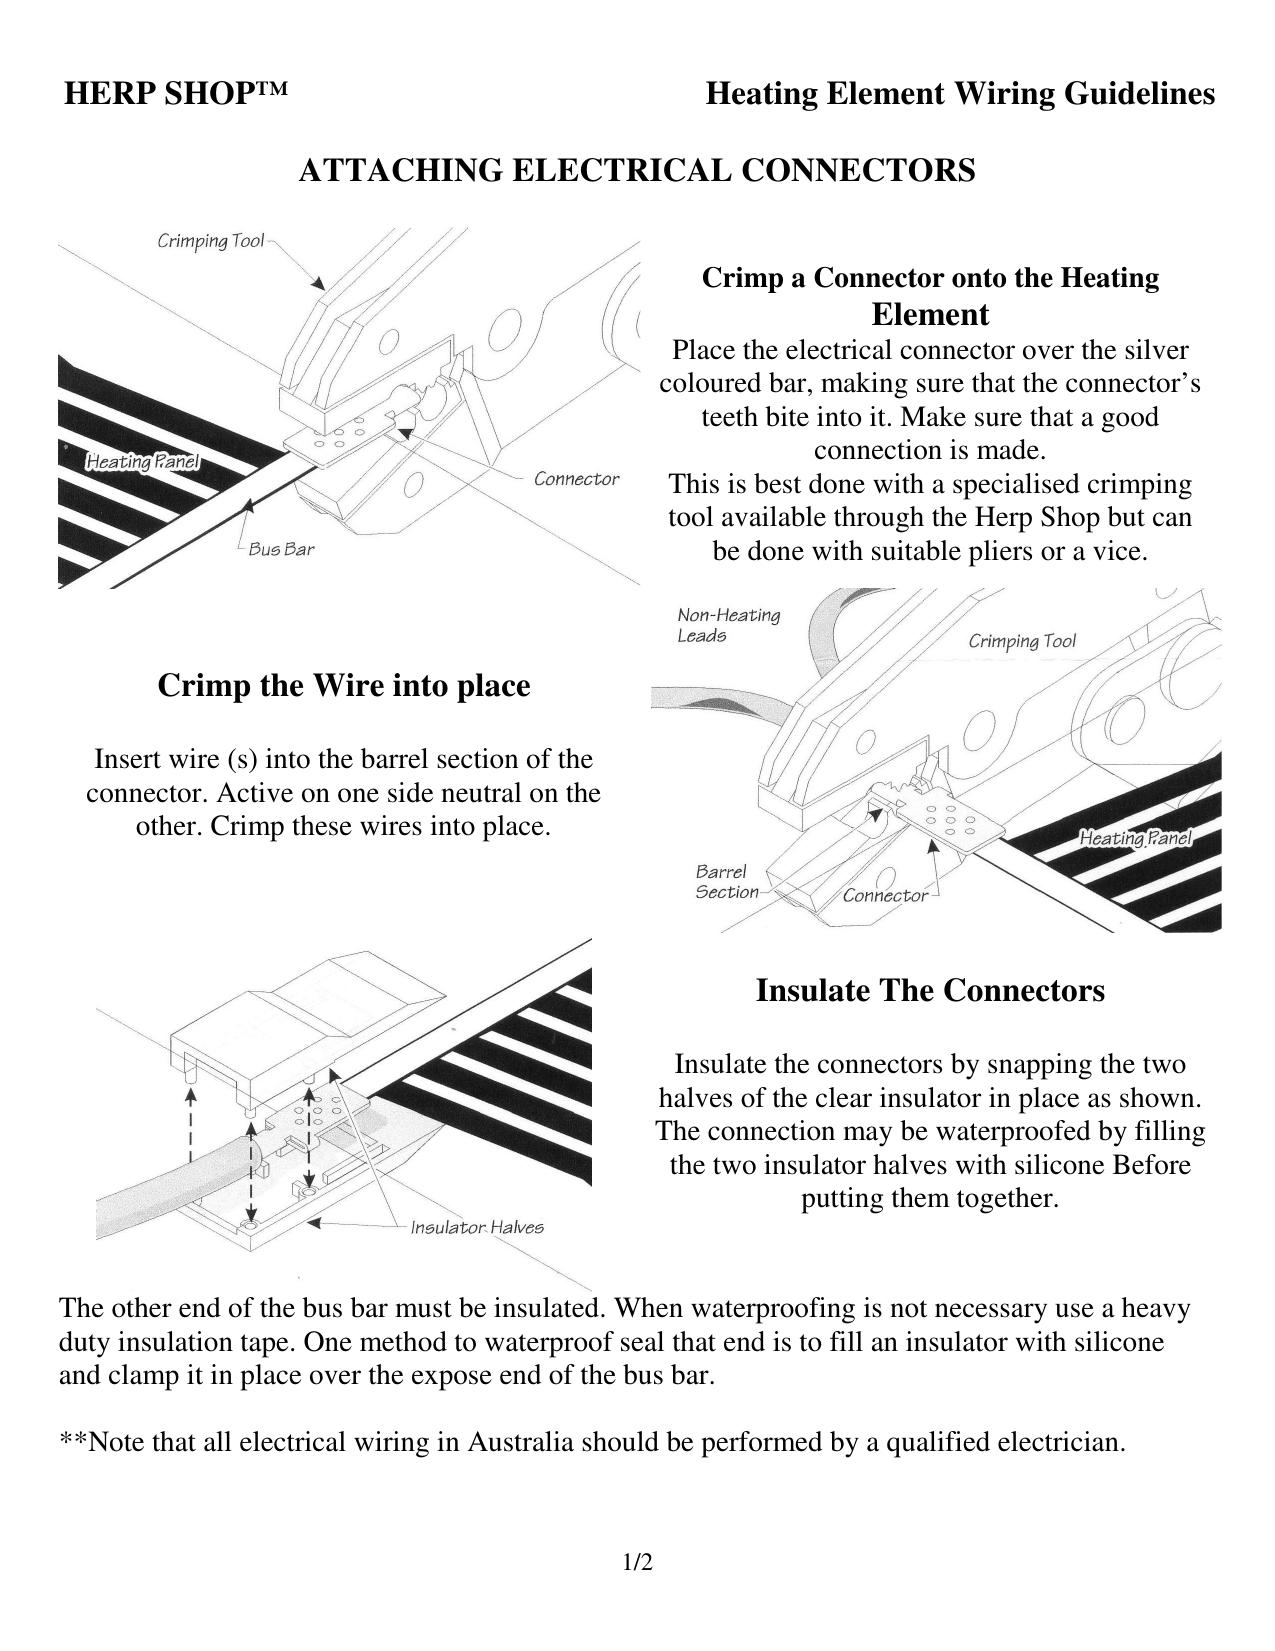 Herp Shop Heating Element Wiring Guidelines Manualzz Com